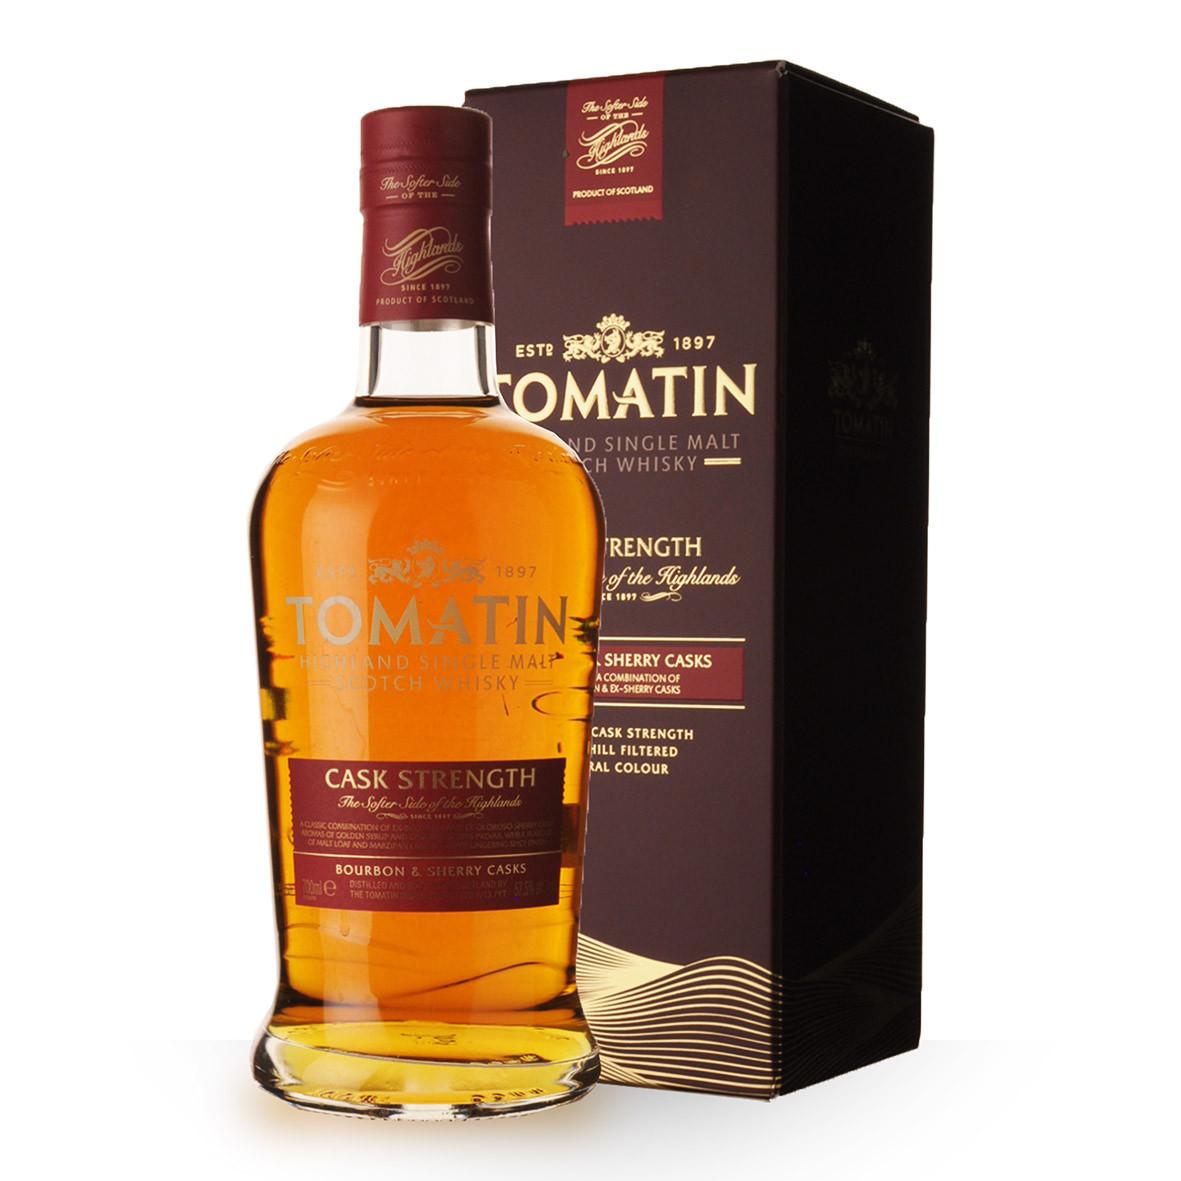 Whisky Tomatin Cask Strength 70cl Etui www.odyssee-vins.com